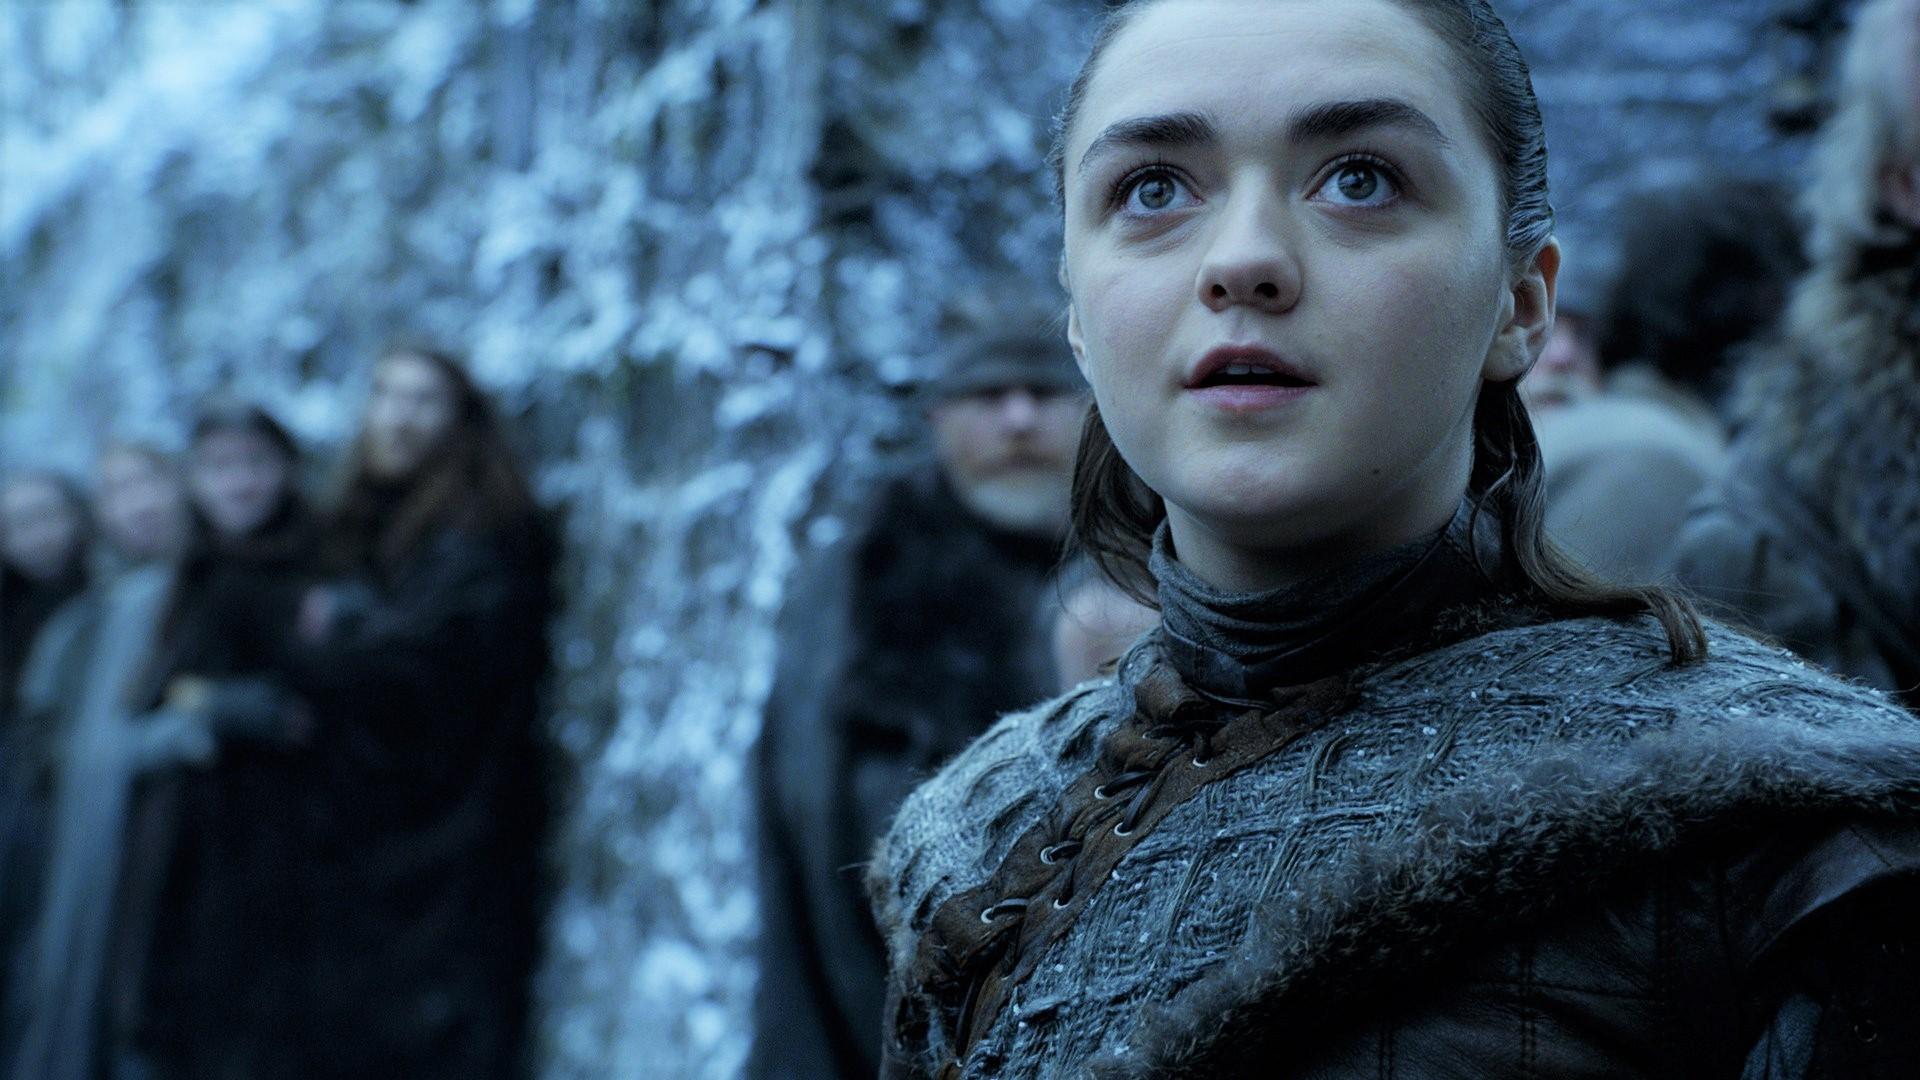 Game of Thrones Sezonul 8 Episodul 1 online subtitrat Arya